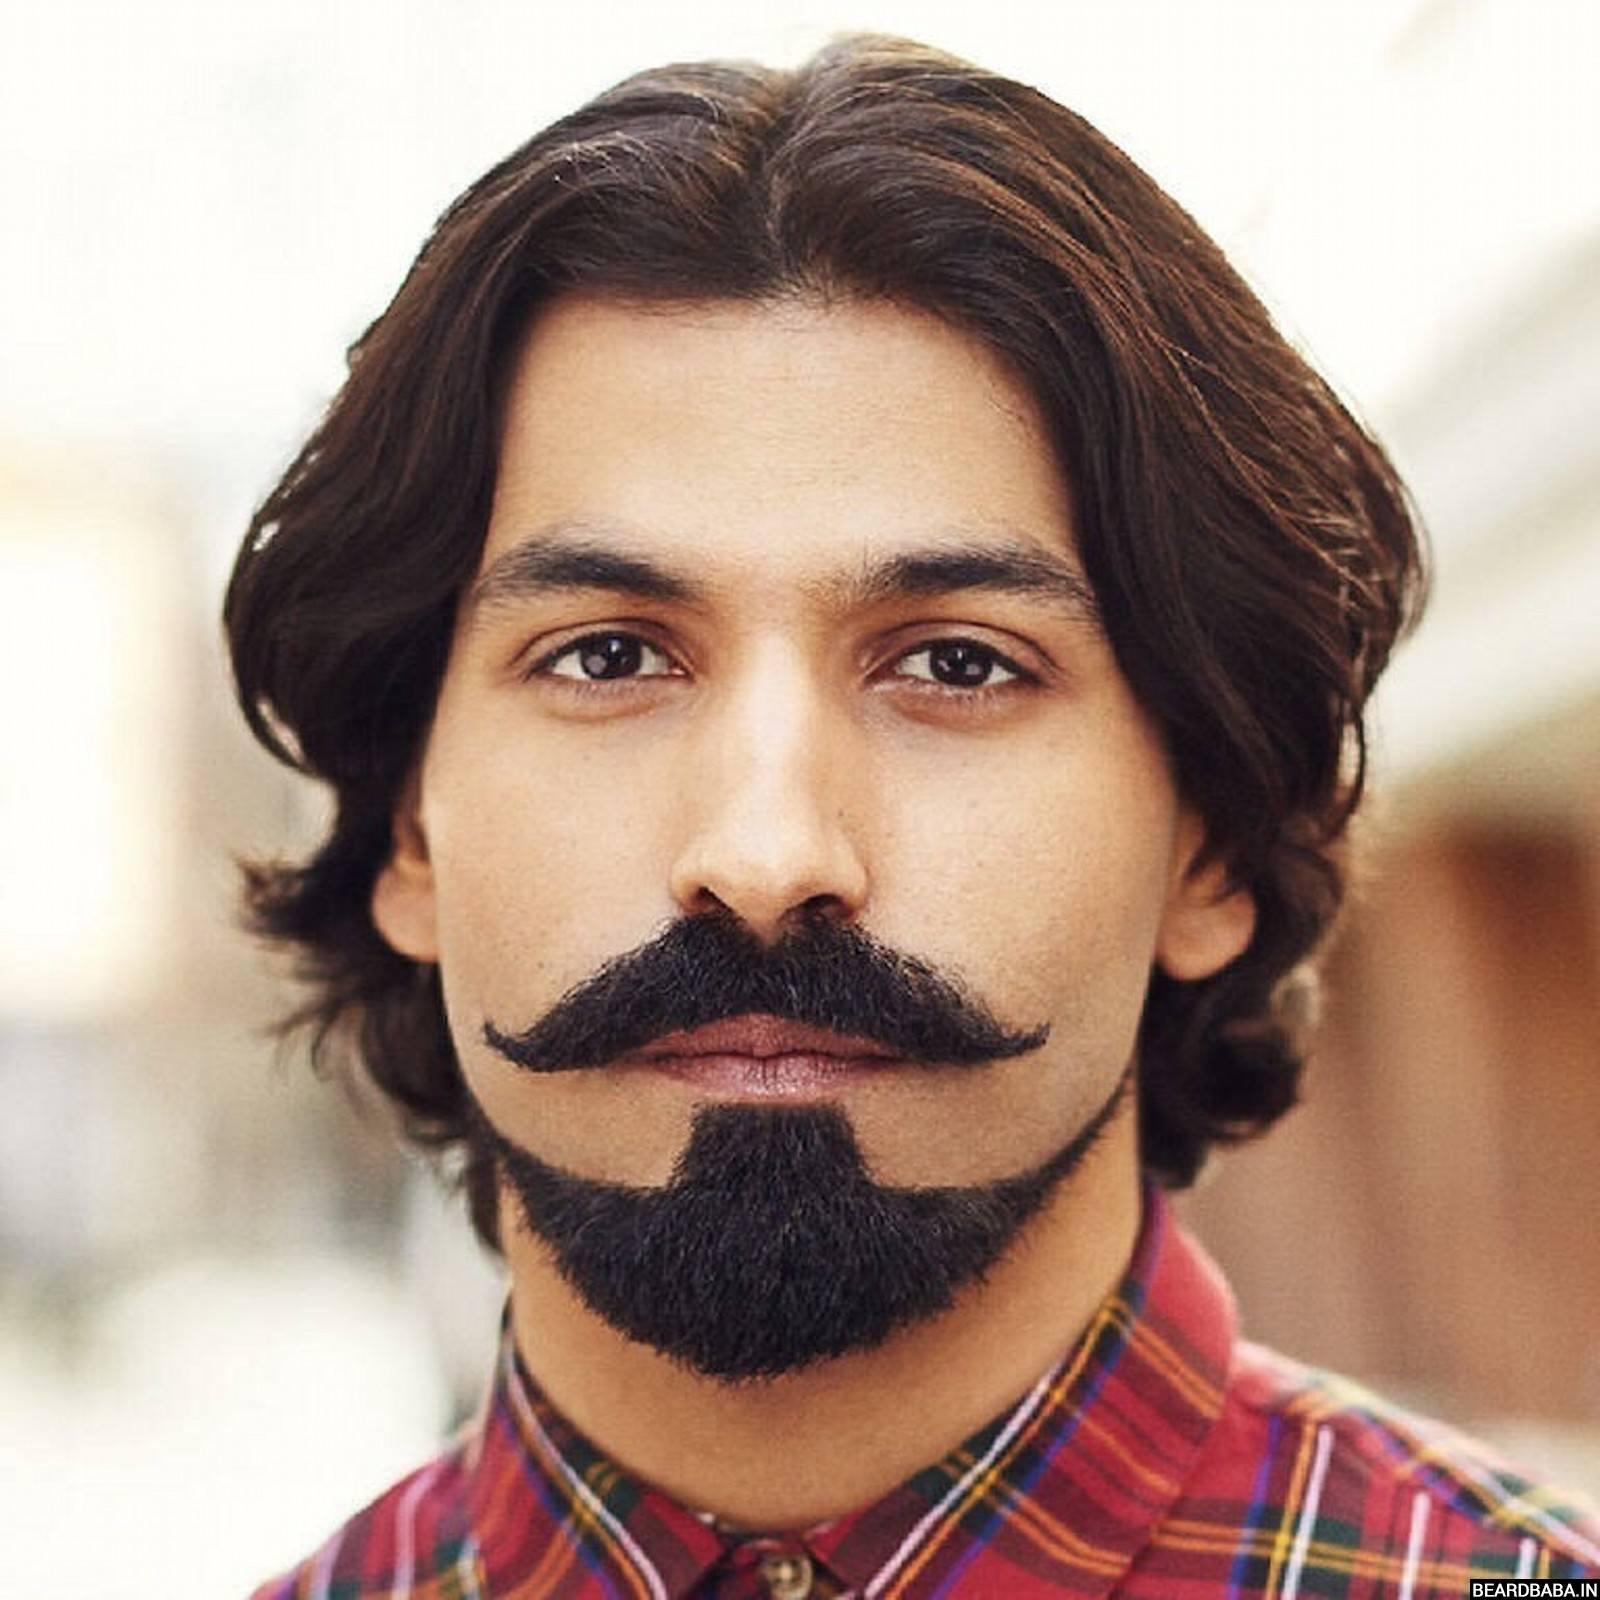 Anchor Beard